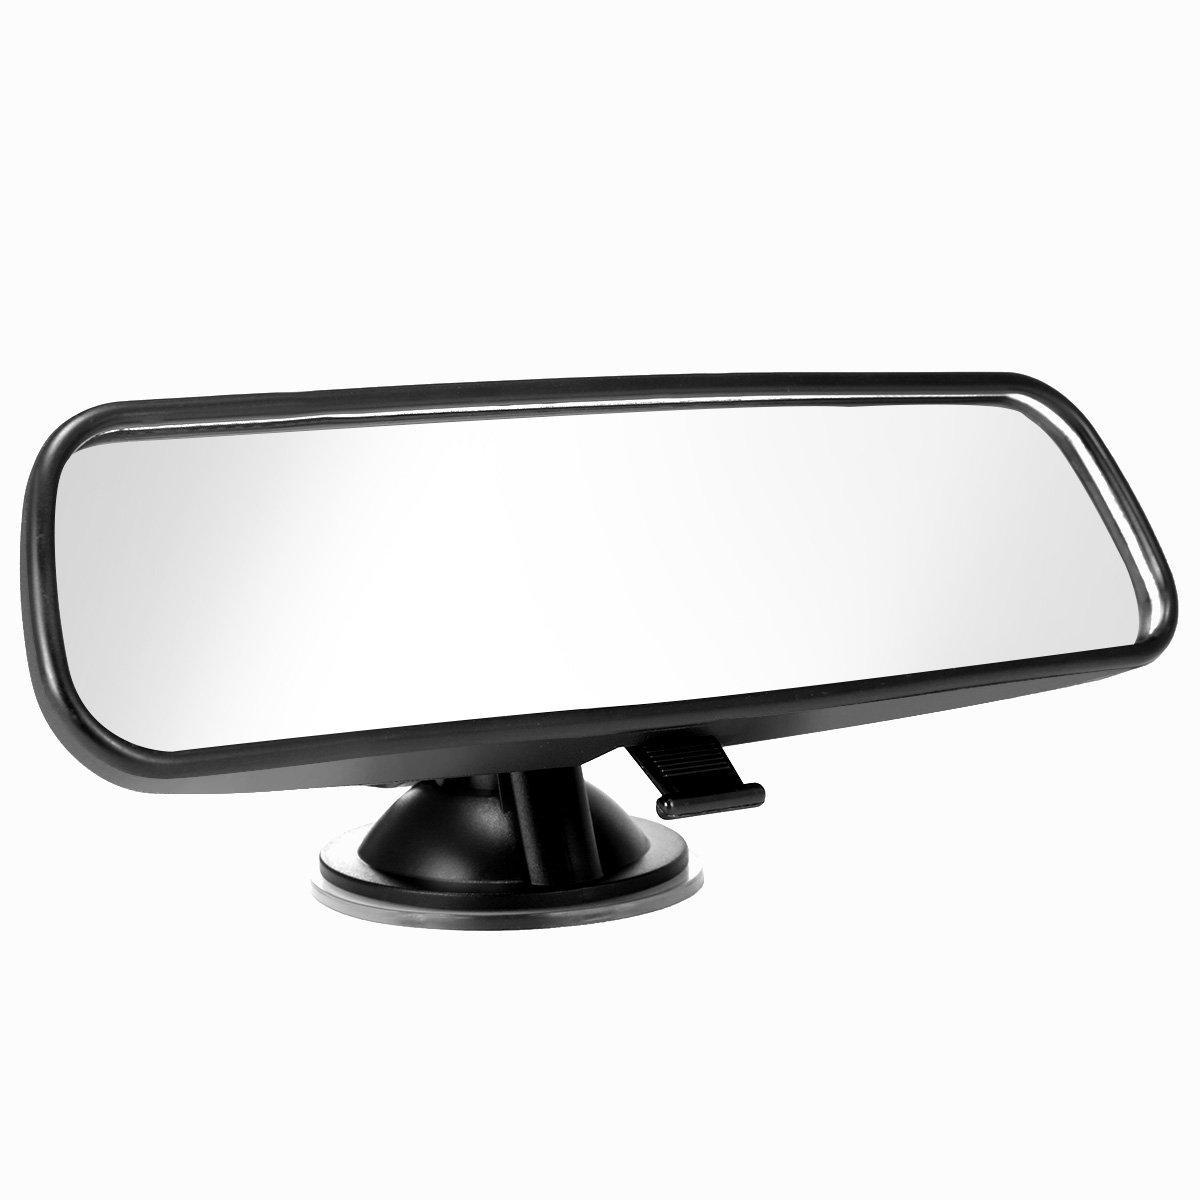 Buy Accessorybasics Universal Car Rear View Mirror Radar